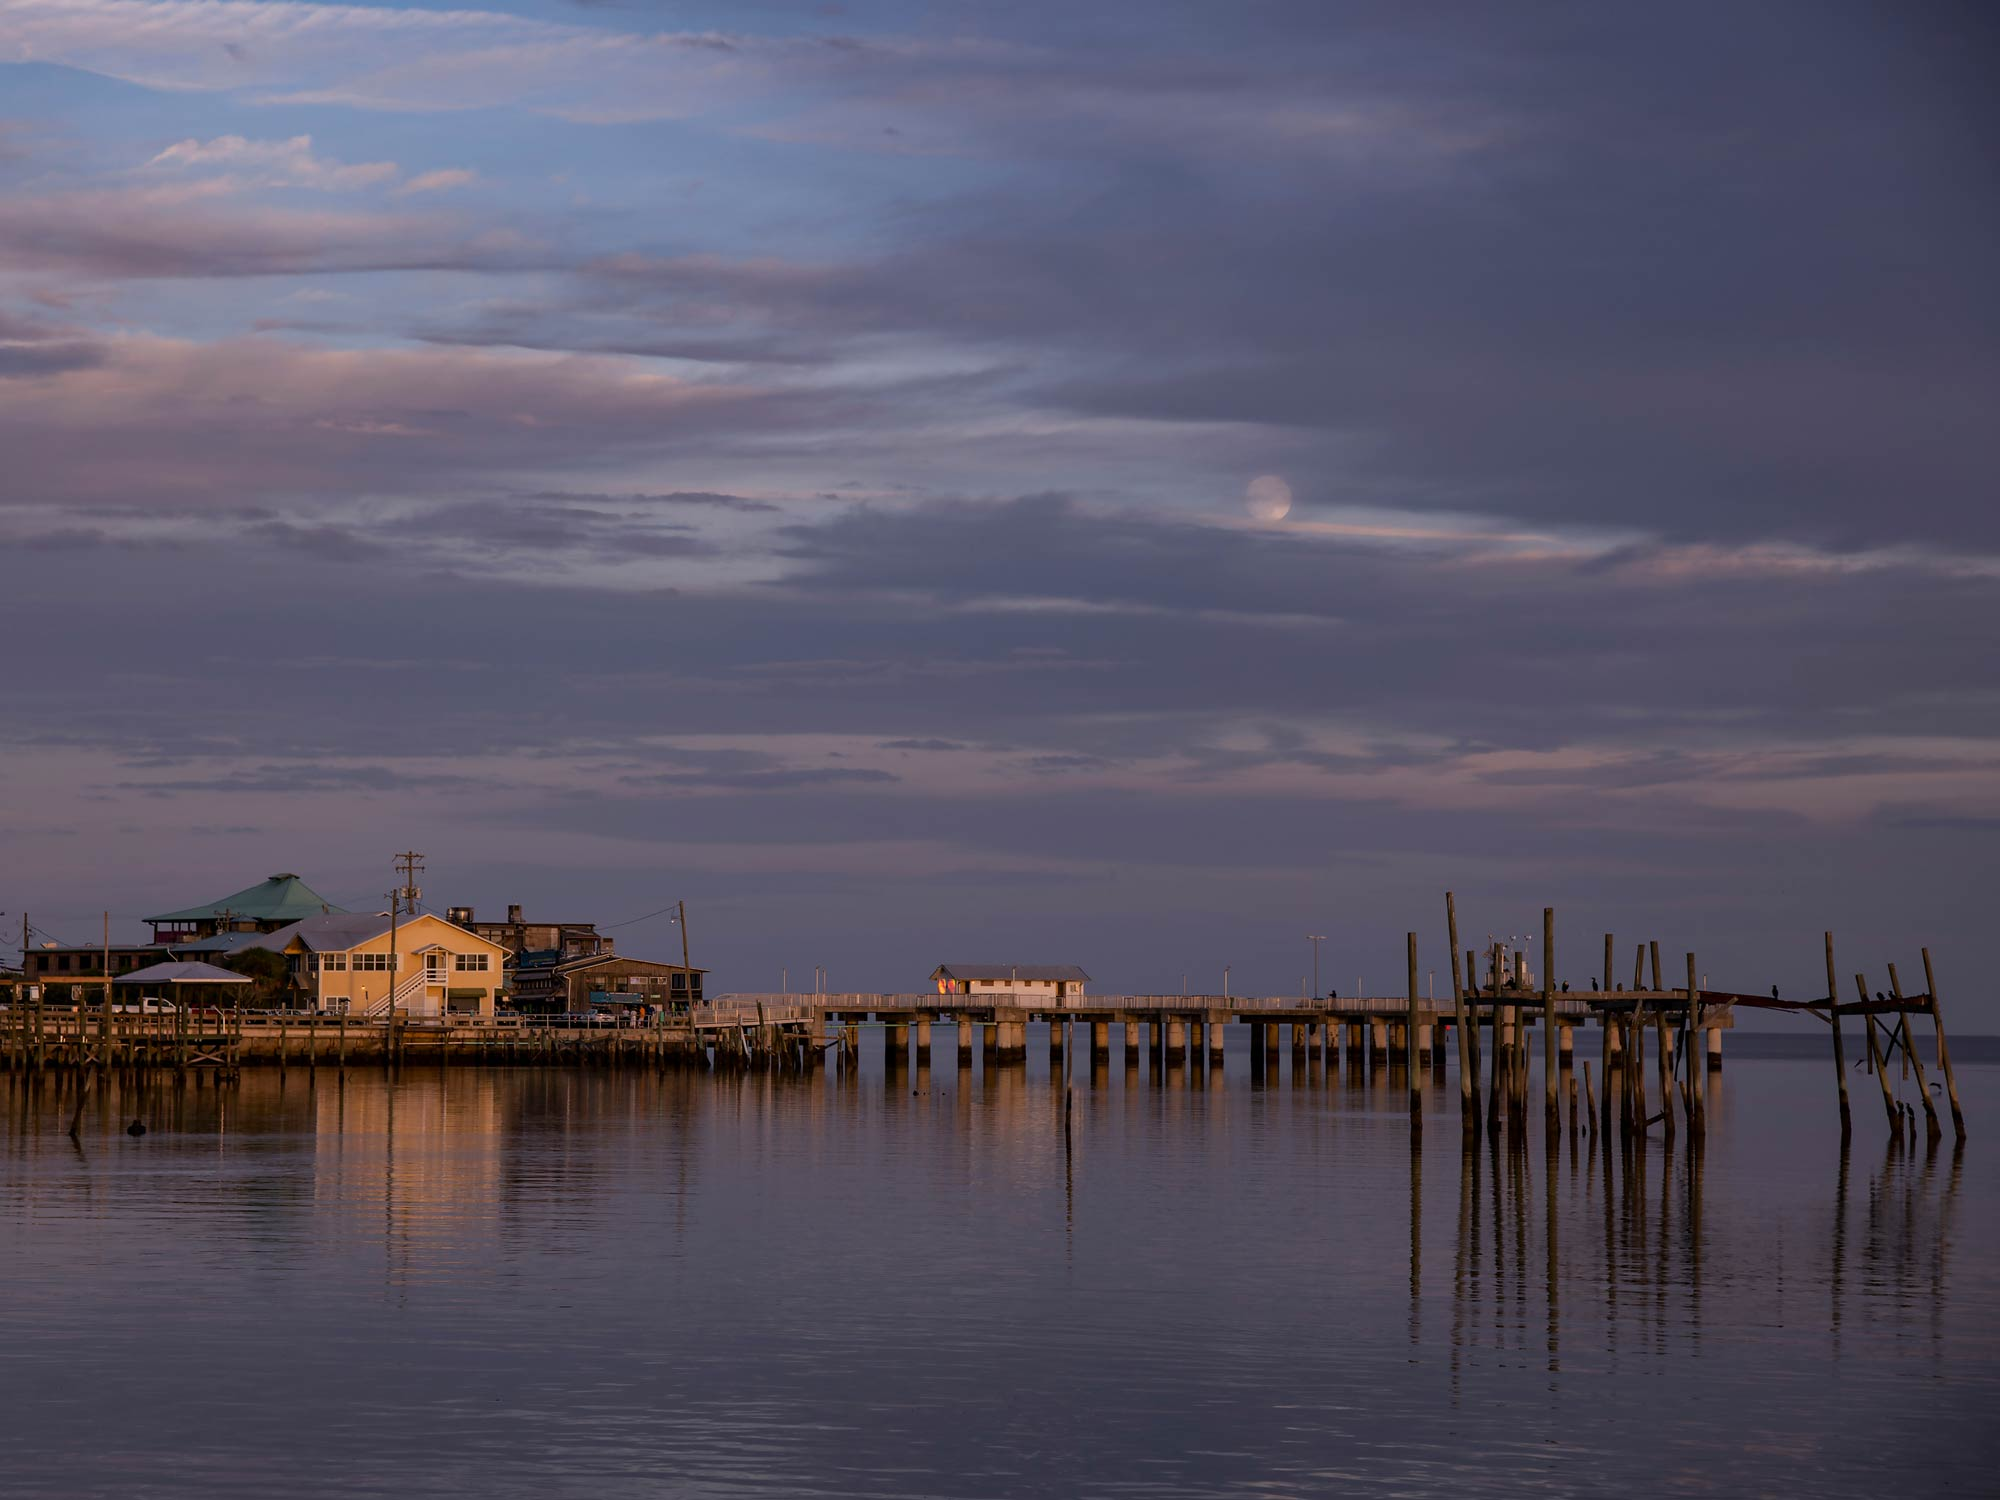 Evening sky with moonrise over Dock Street in Cedar Key, Florida